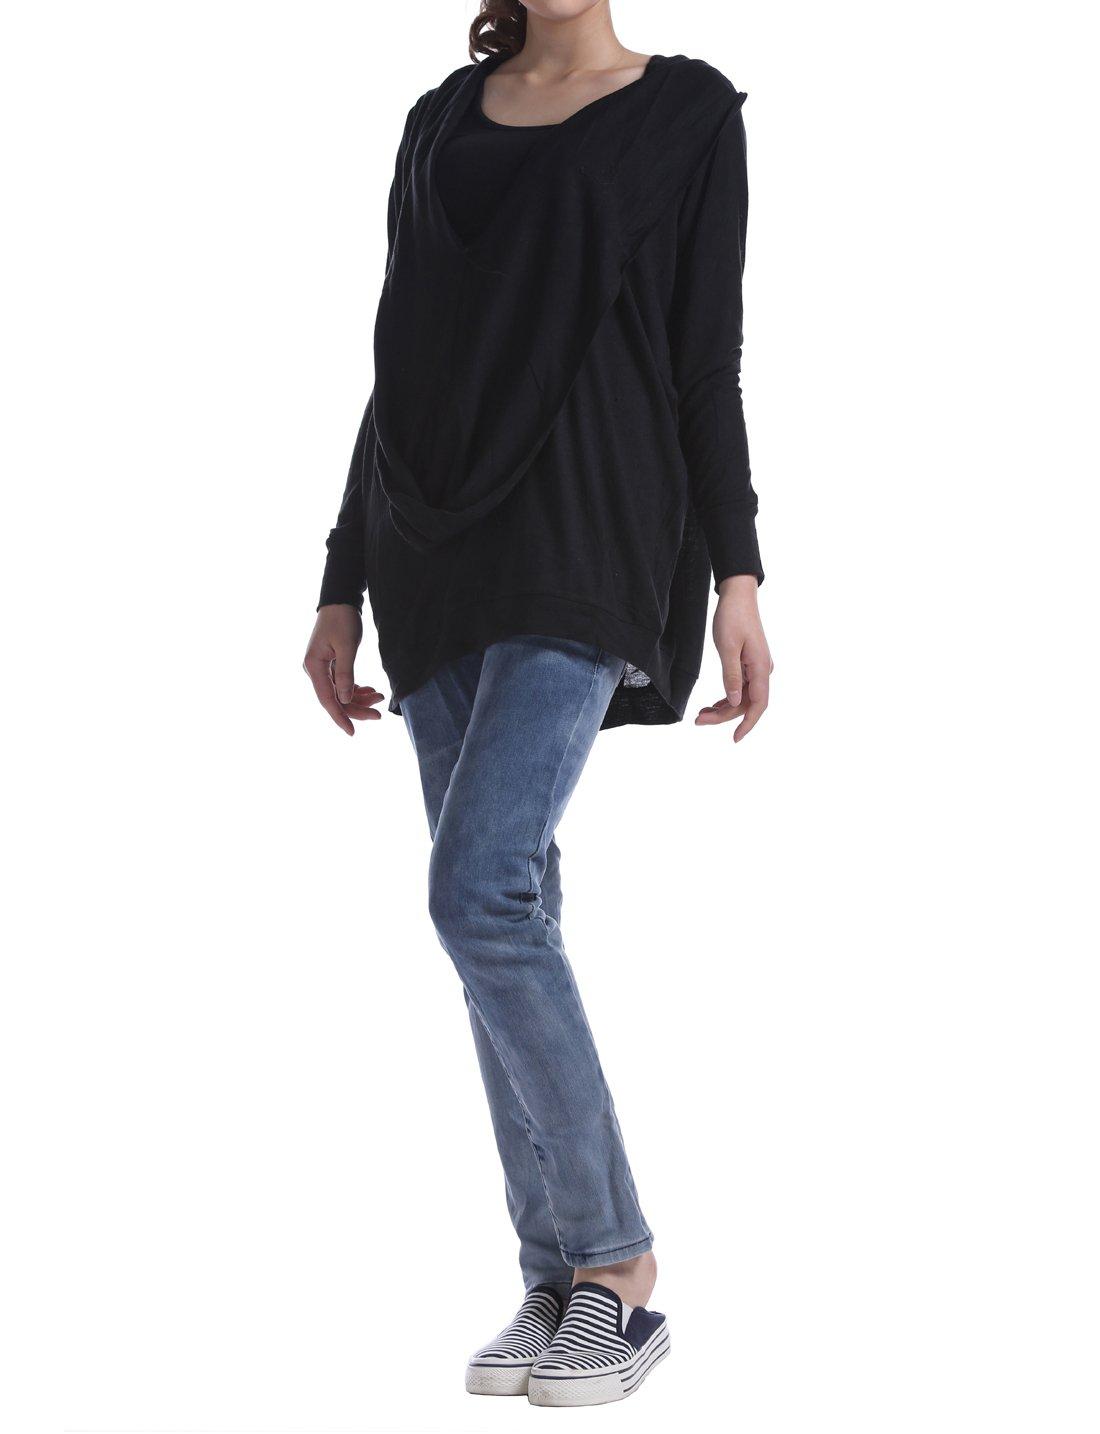 Huan Xun Women's Deep V Neck Draped Front Batwing Knitwear Blouse Cotton (Black)